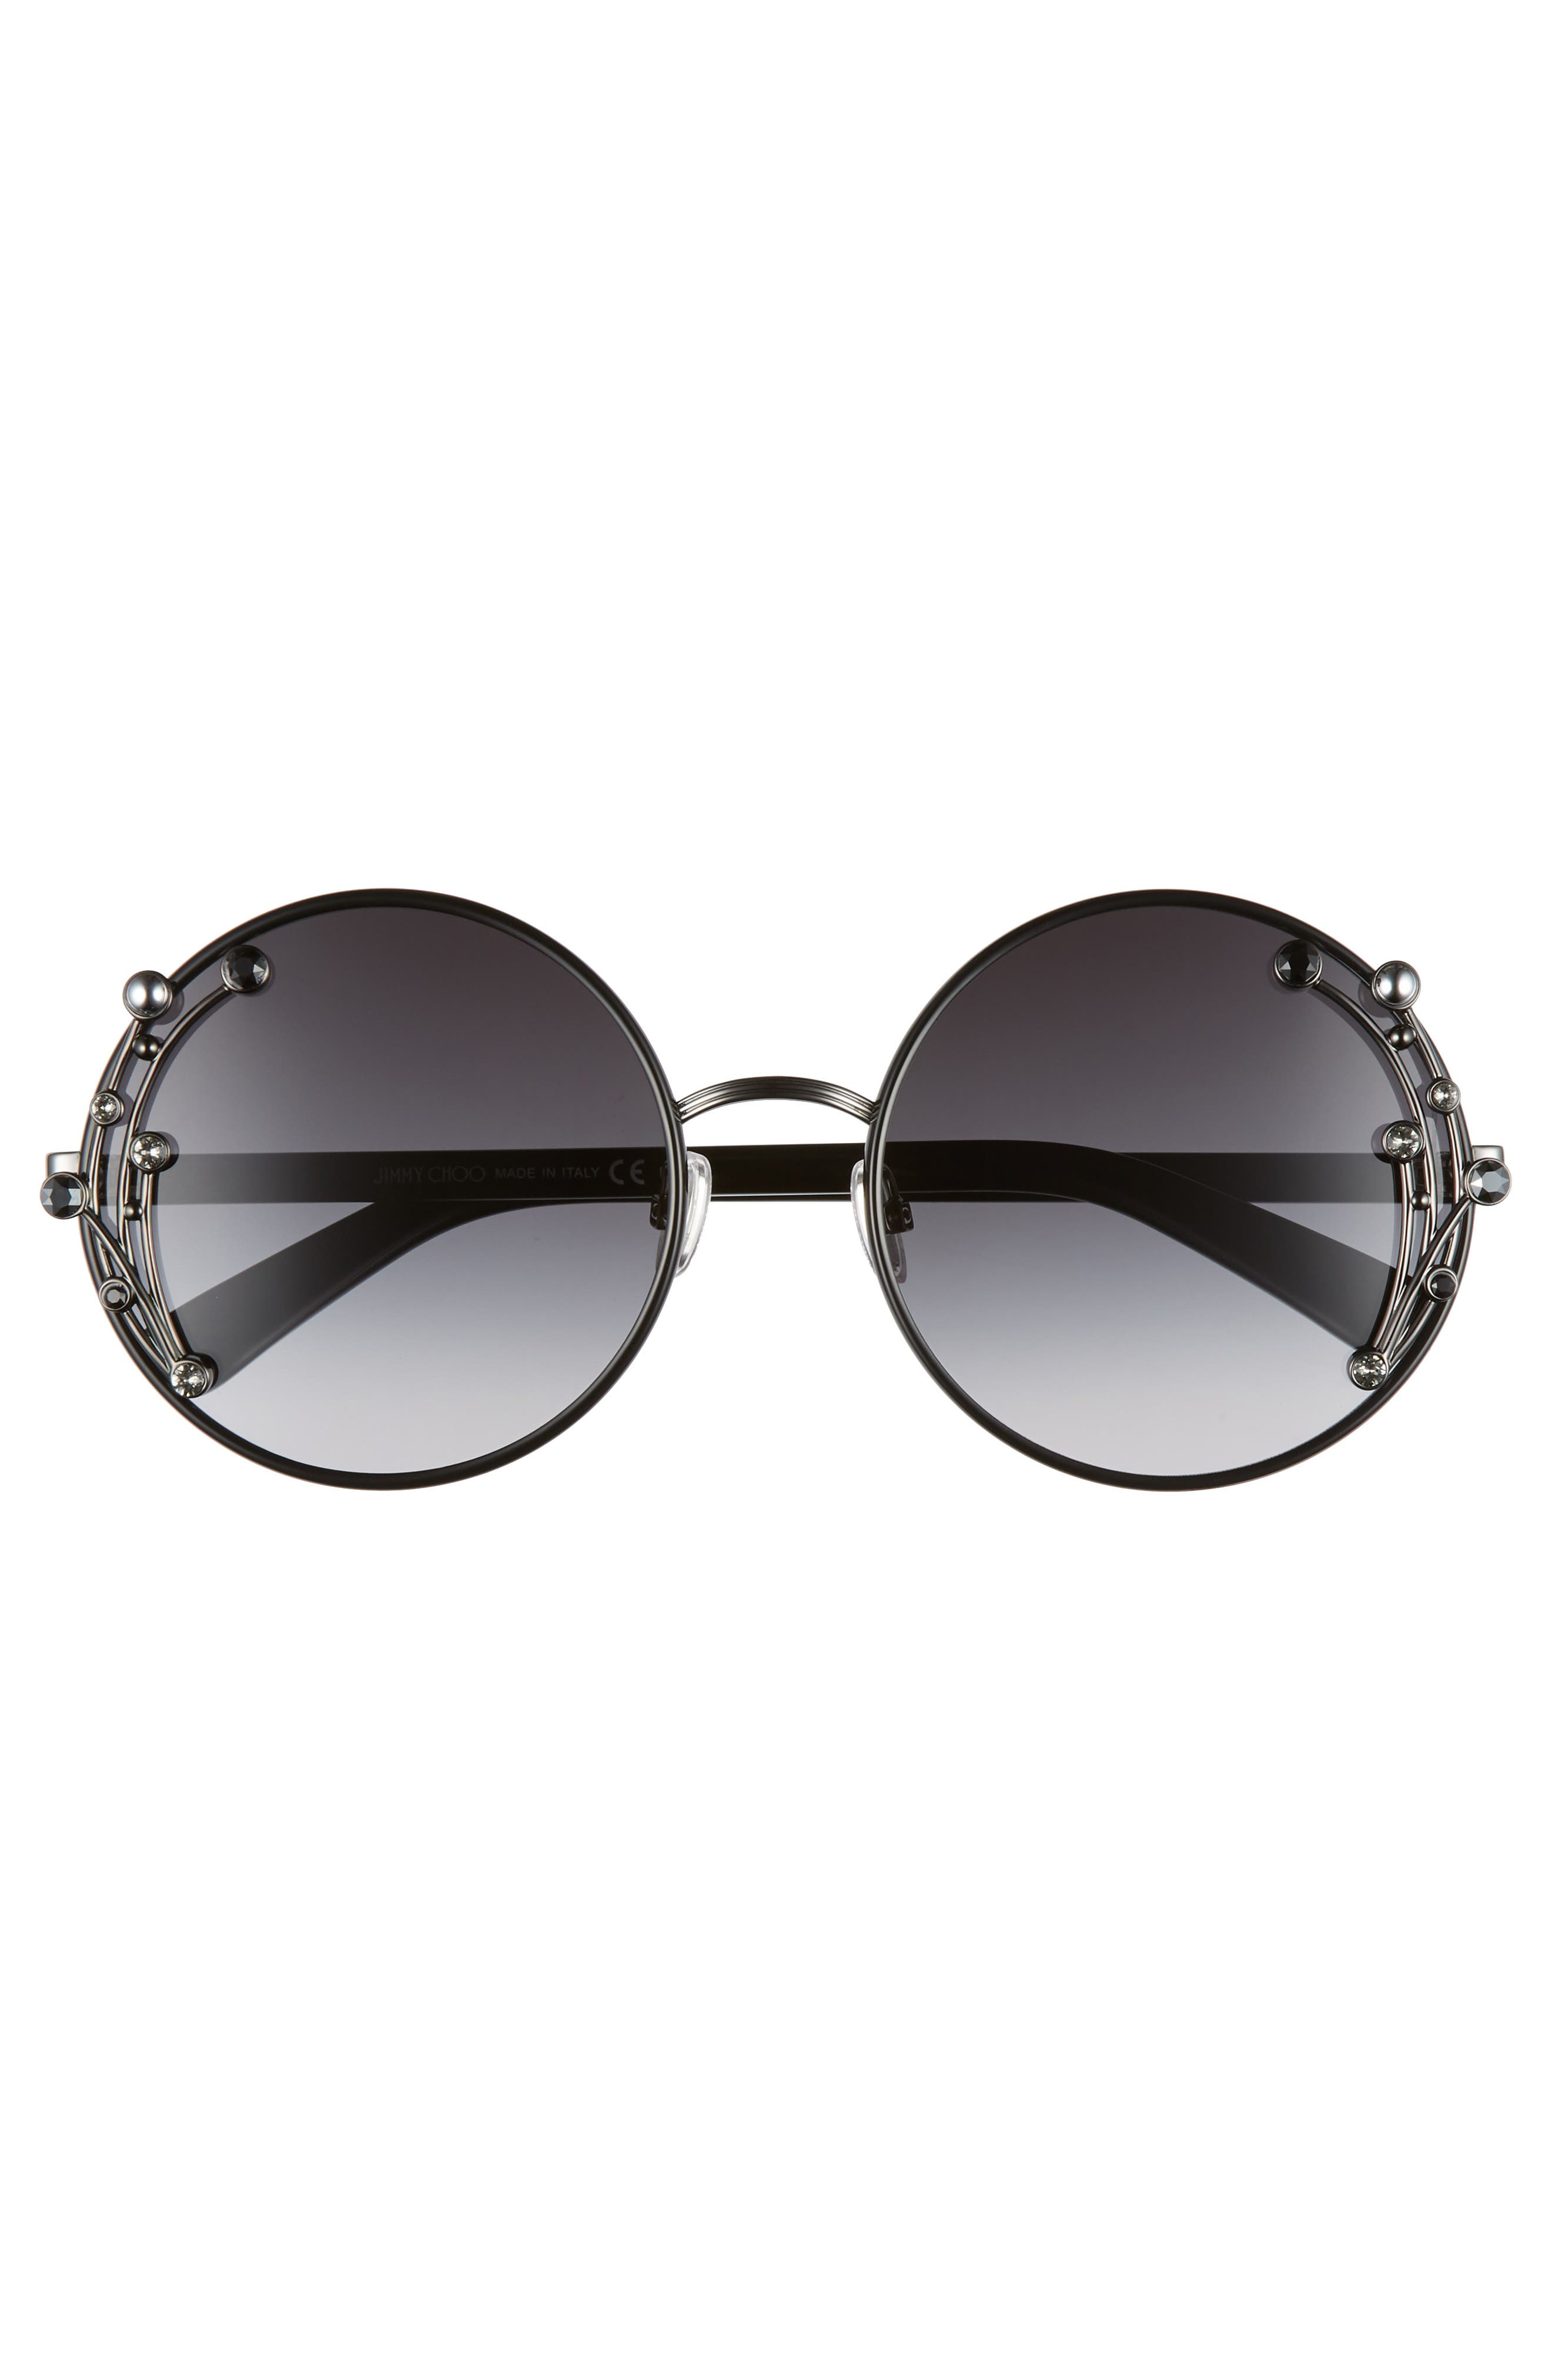 JIMMY CHOO,                             Gema 59mm Round Sunglasses,                             Alternate thumbnail 3, color,                             BLACK